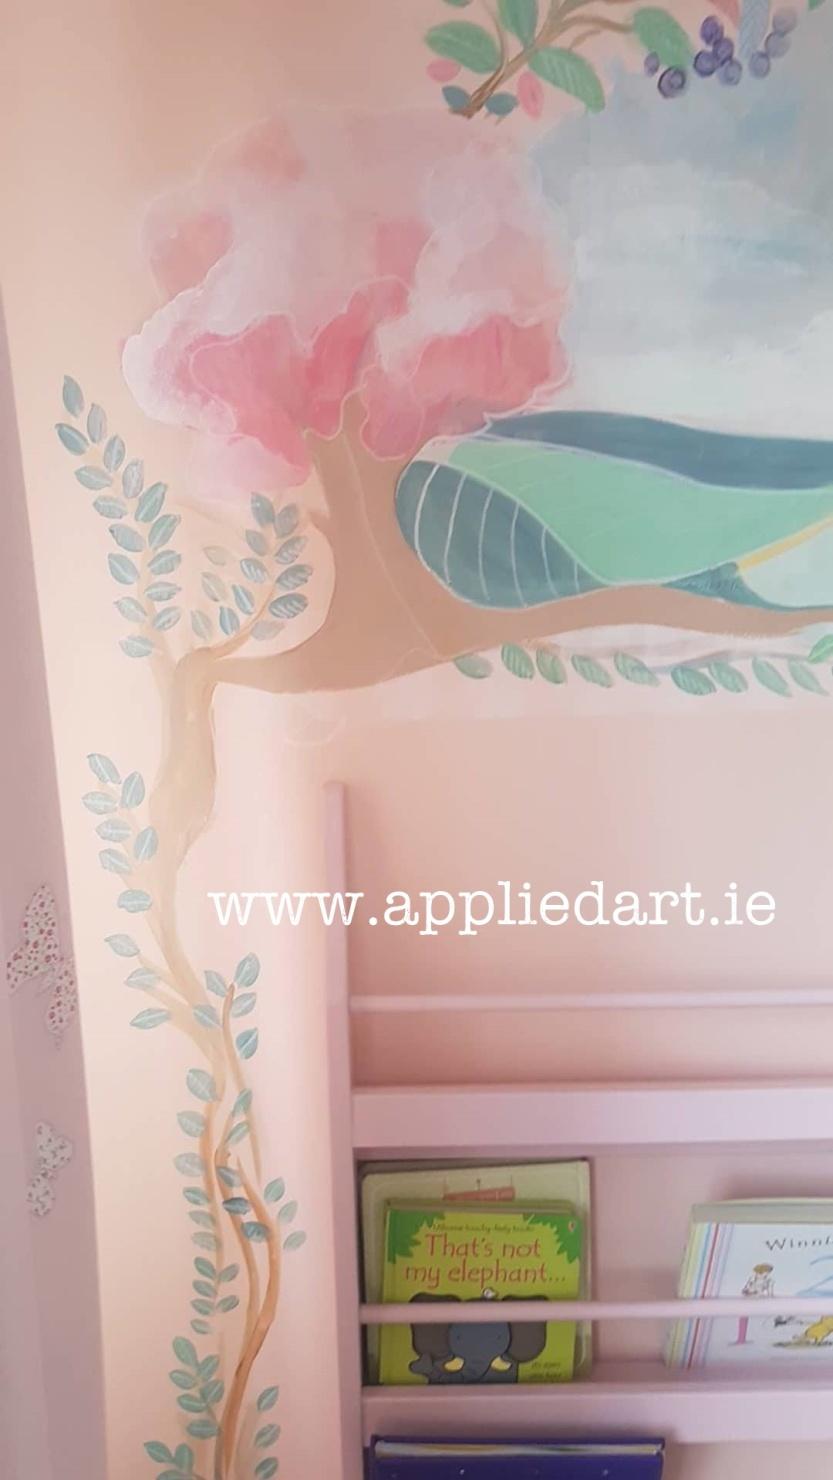 wonderland theme mushroom fairy mural dublin artist muralist painting fairy theme aapplied art ie